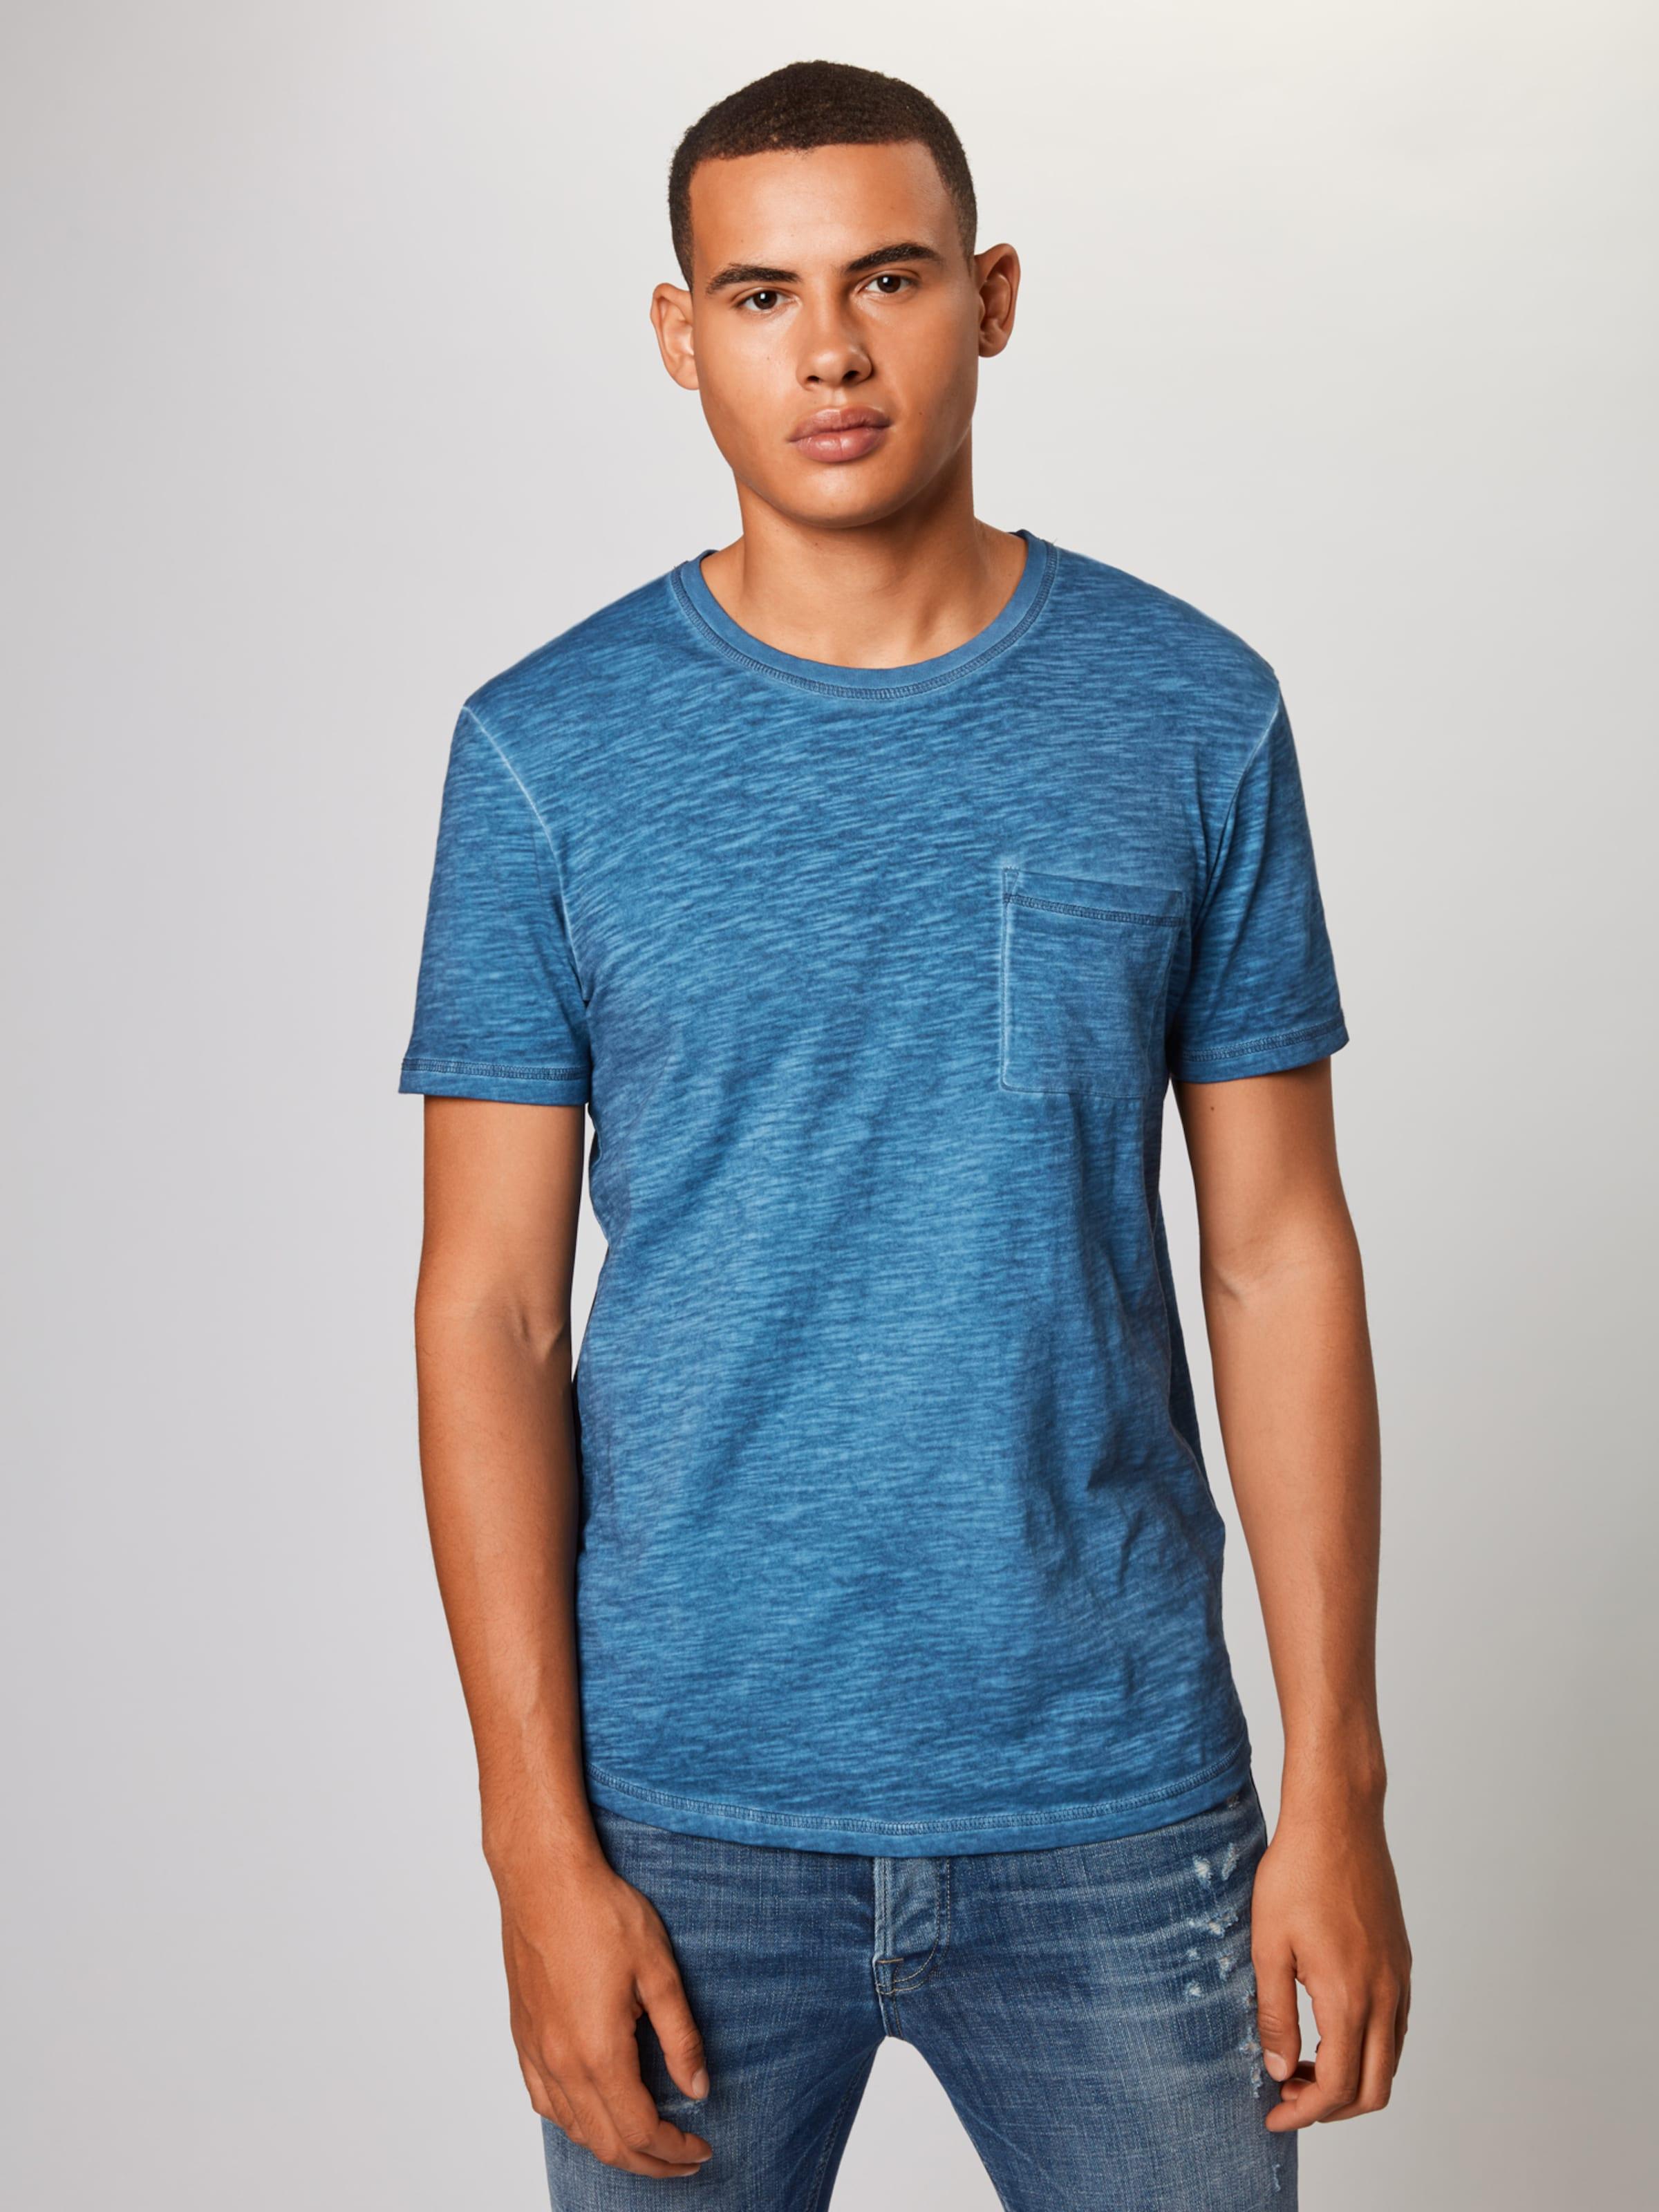 Esprit En shirt Gris T Edc By WYHIED29